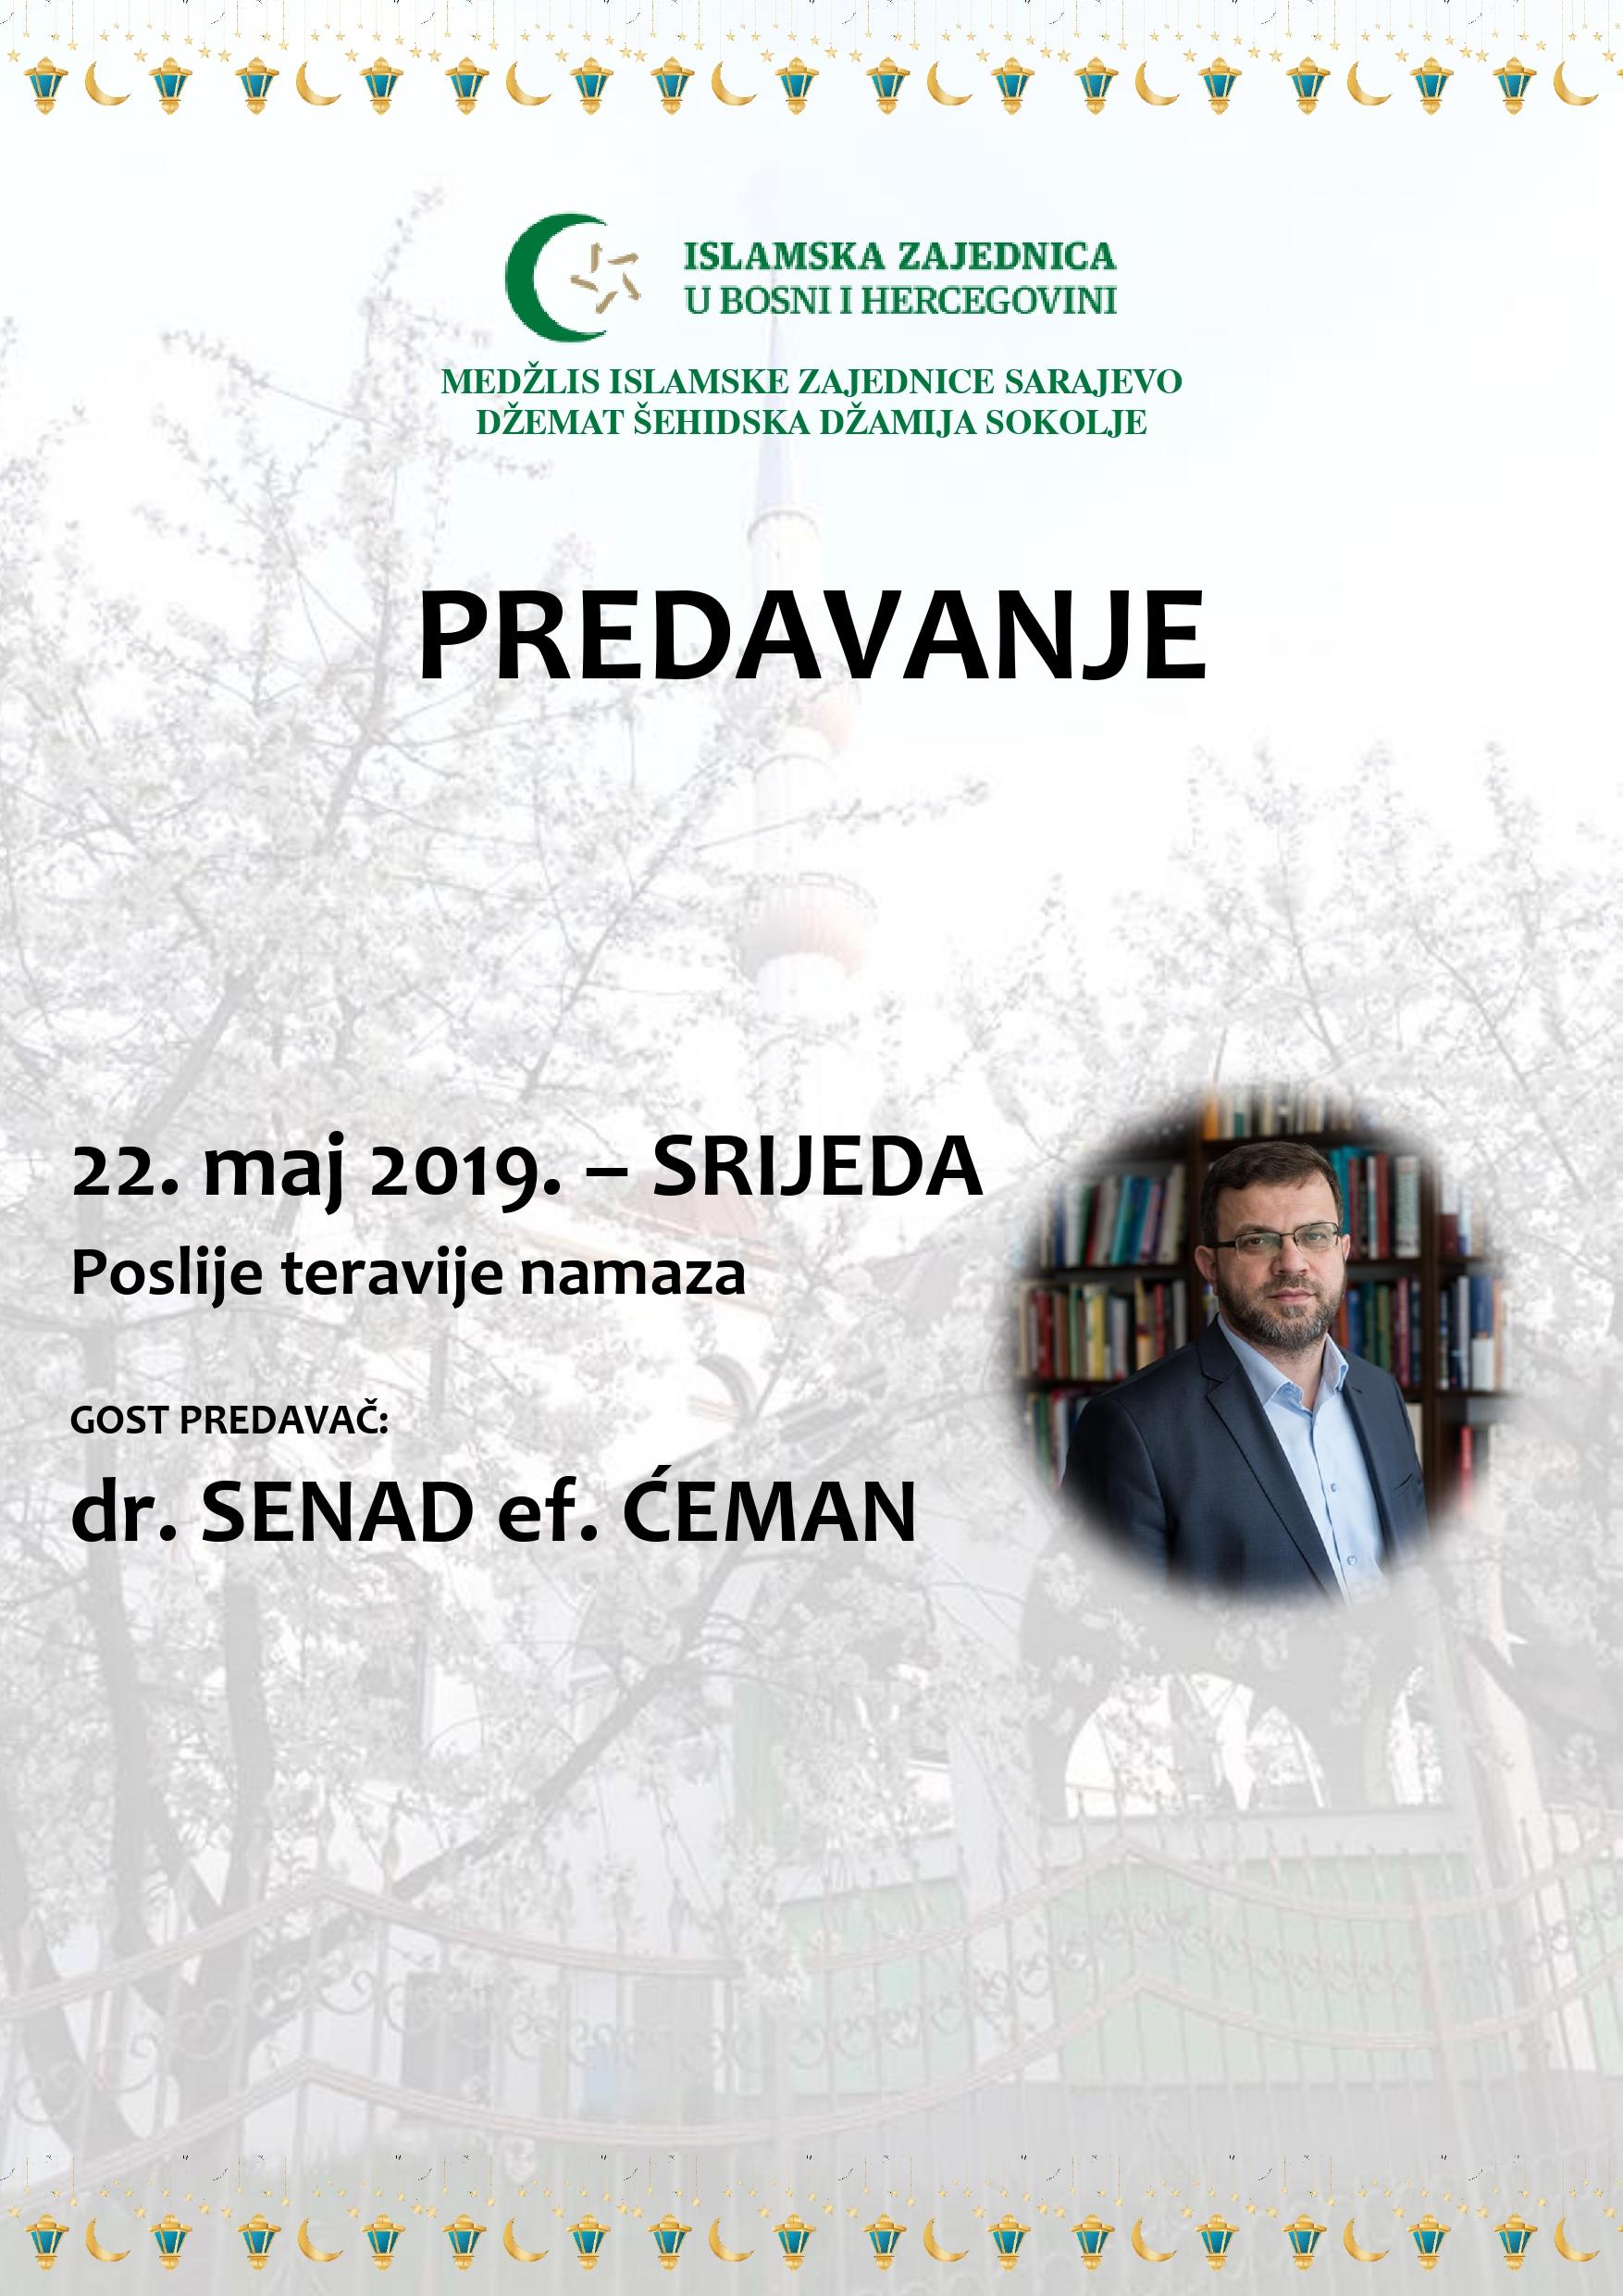 Predavanje dr. Senada Ćemana